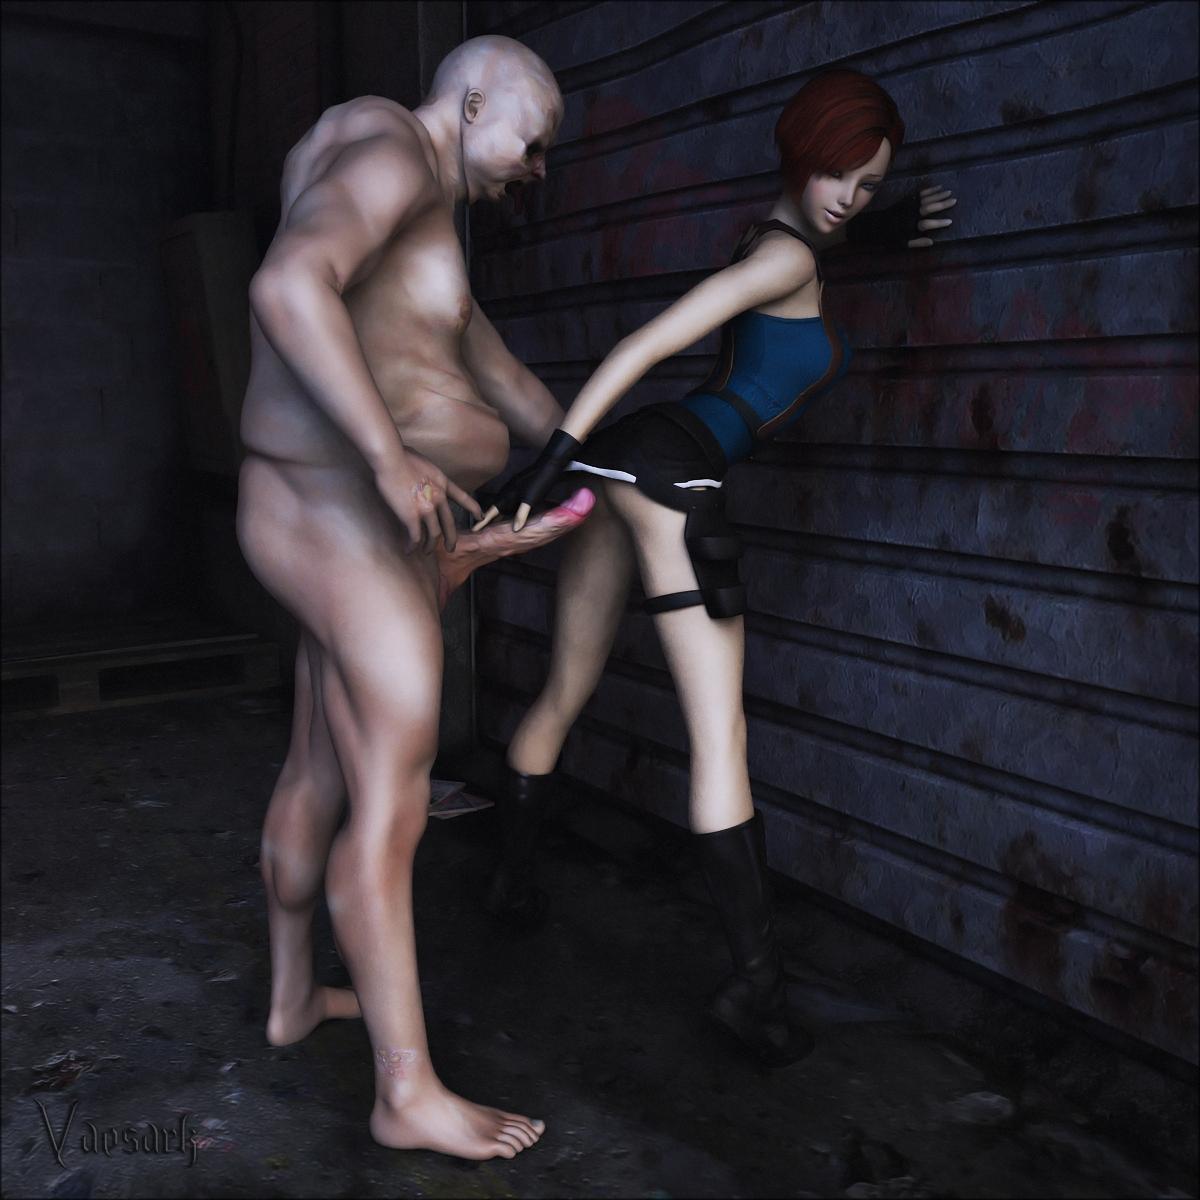 Resident evil porn game fucks pics